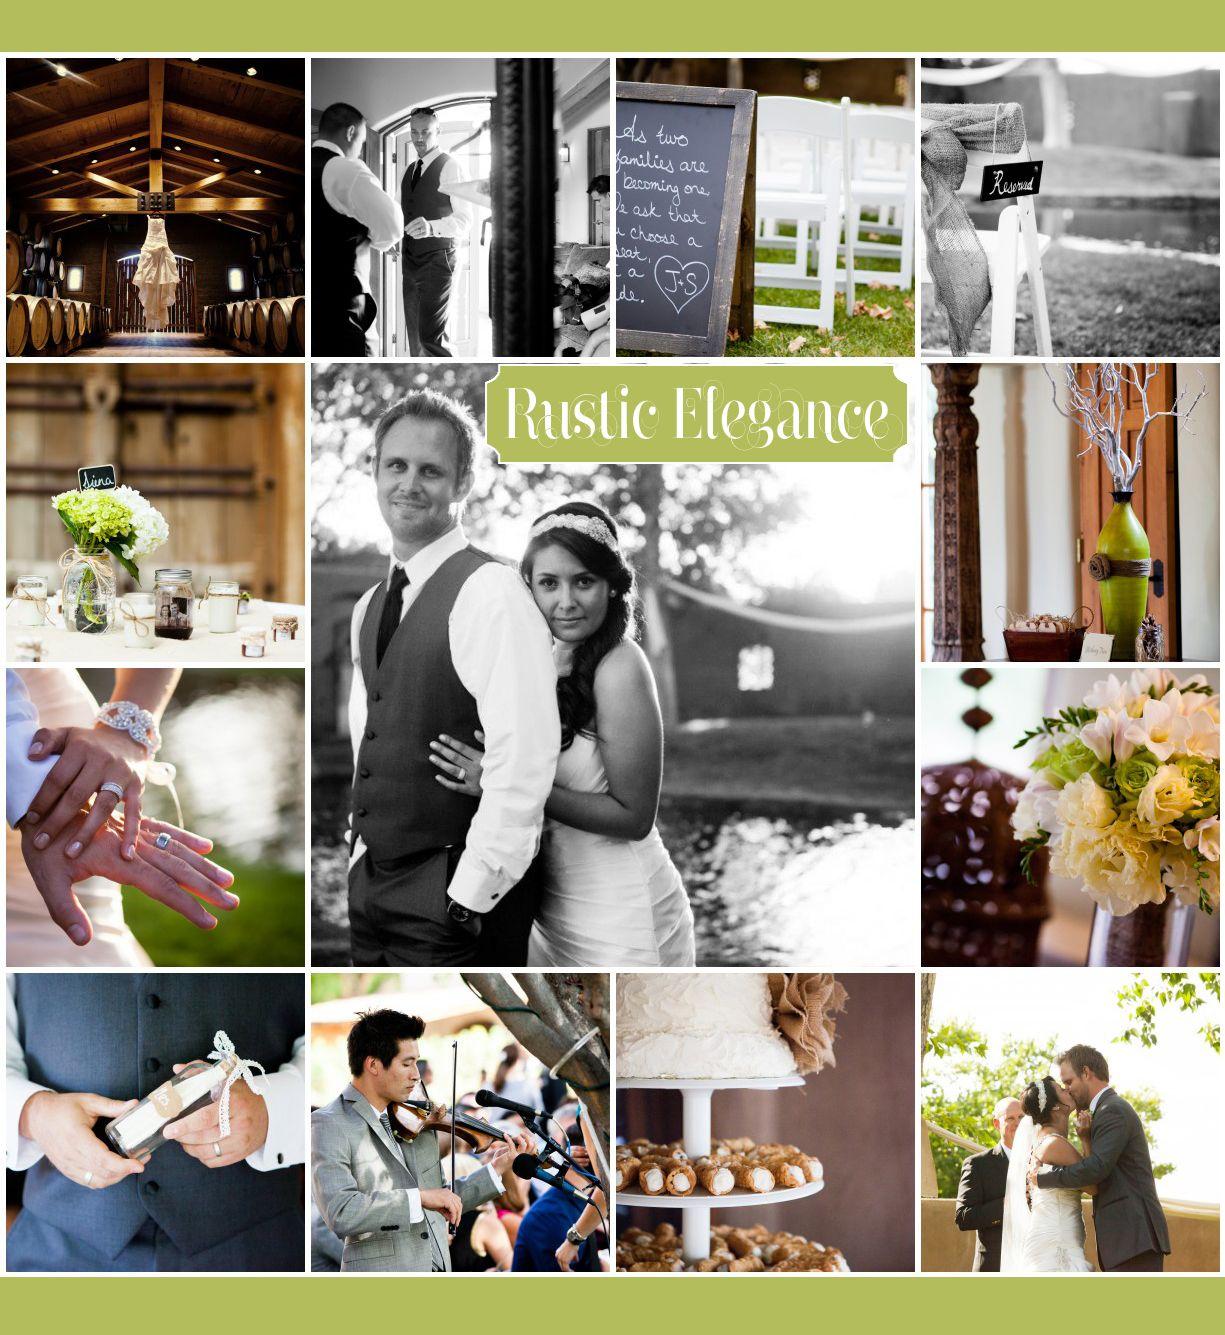 Jenae u shaneus stunning rustic elegance wedding at casa rondena